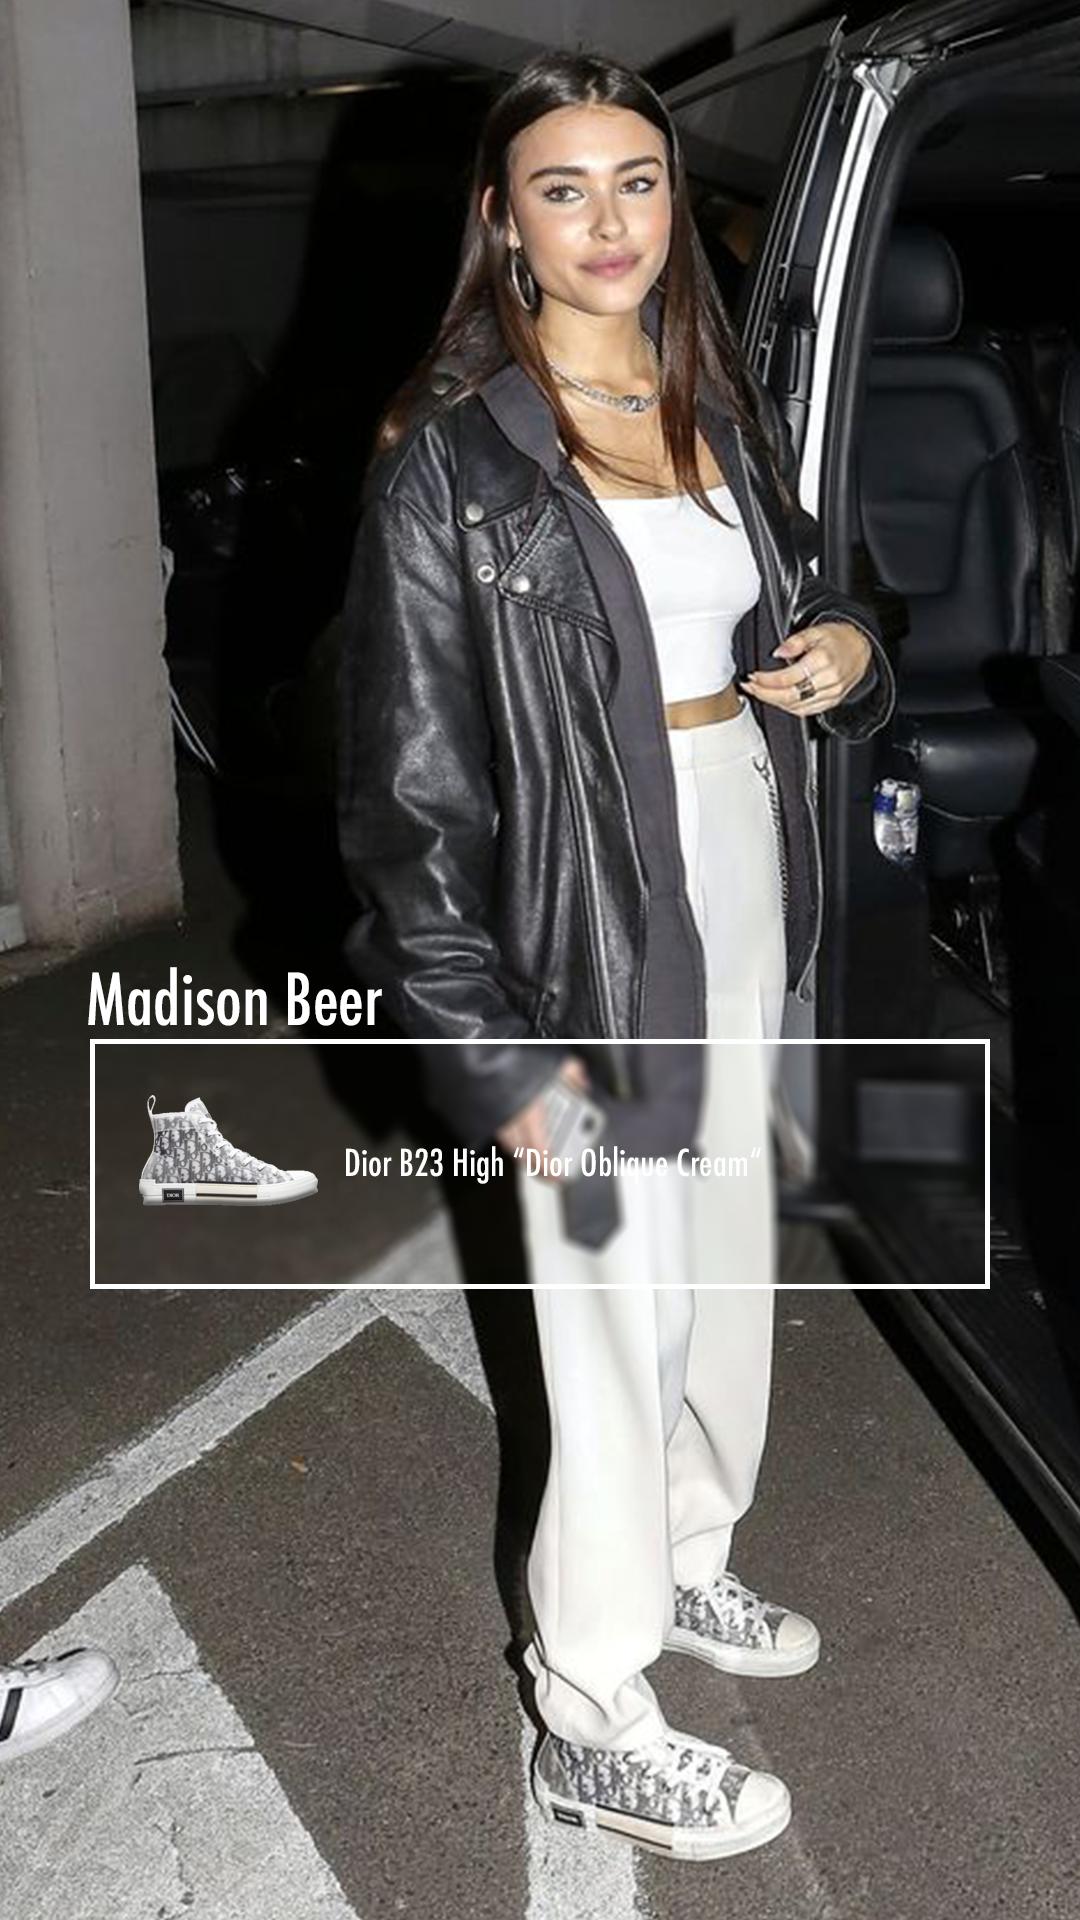 Madison Beer: Dior B23 High \